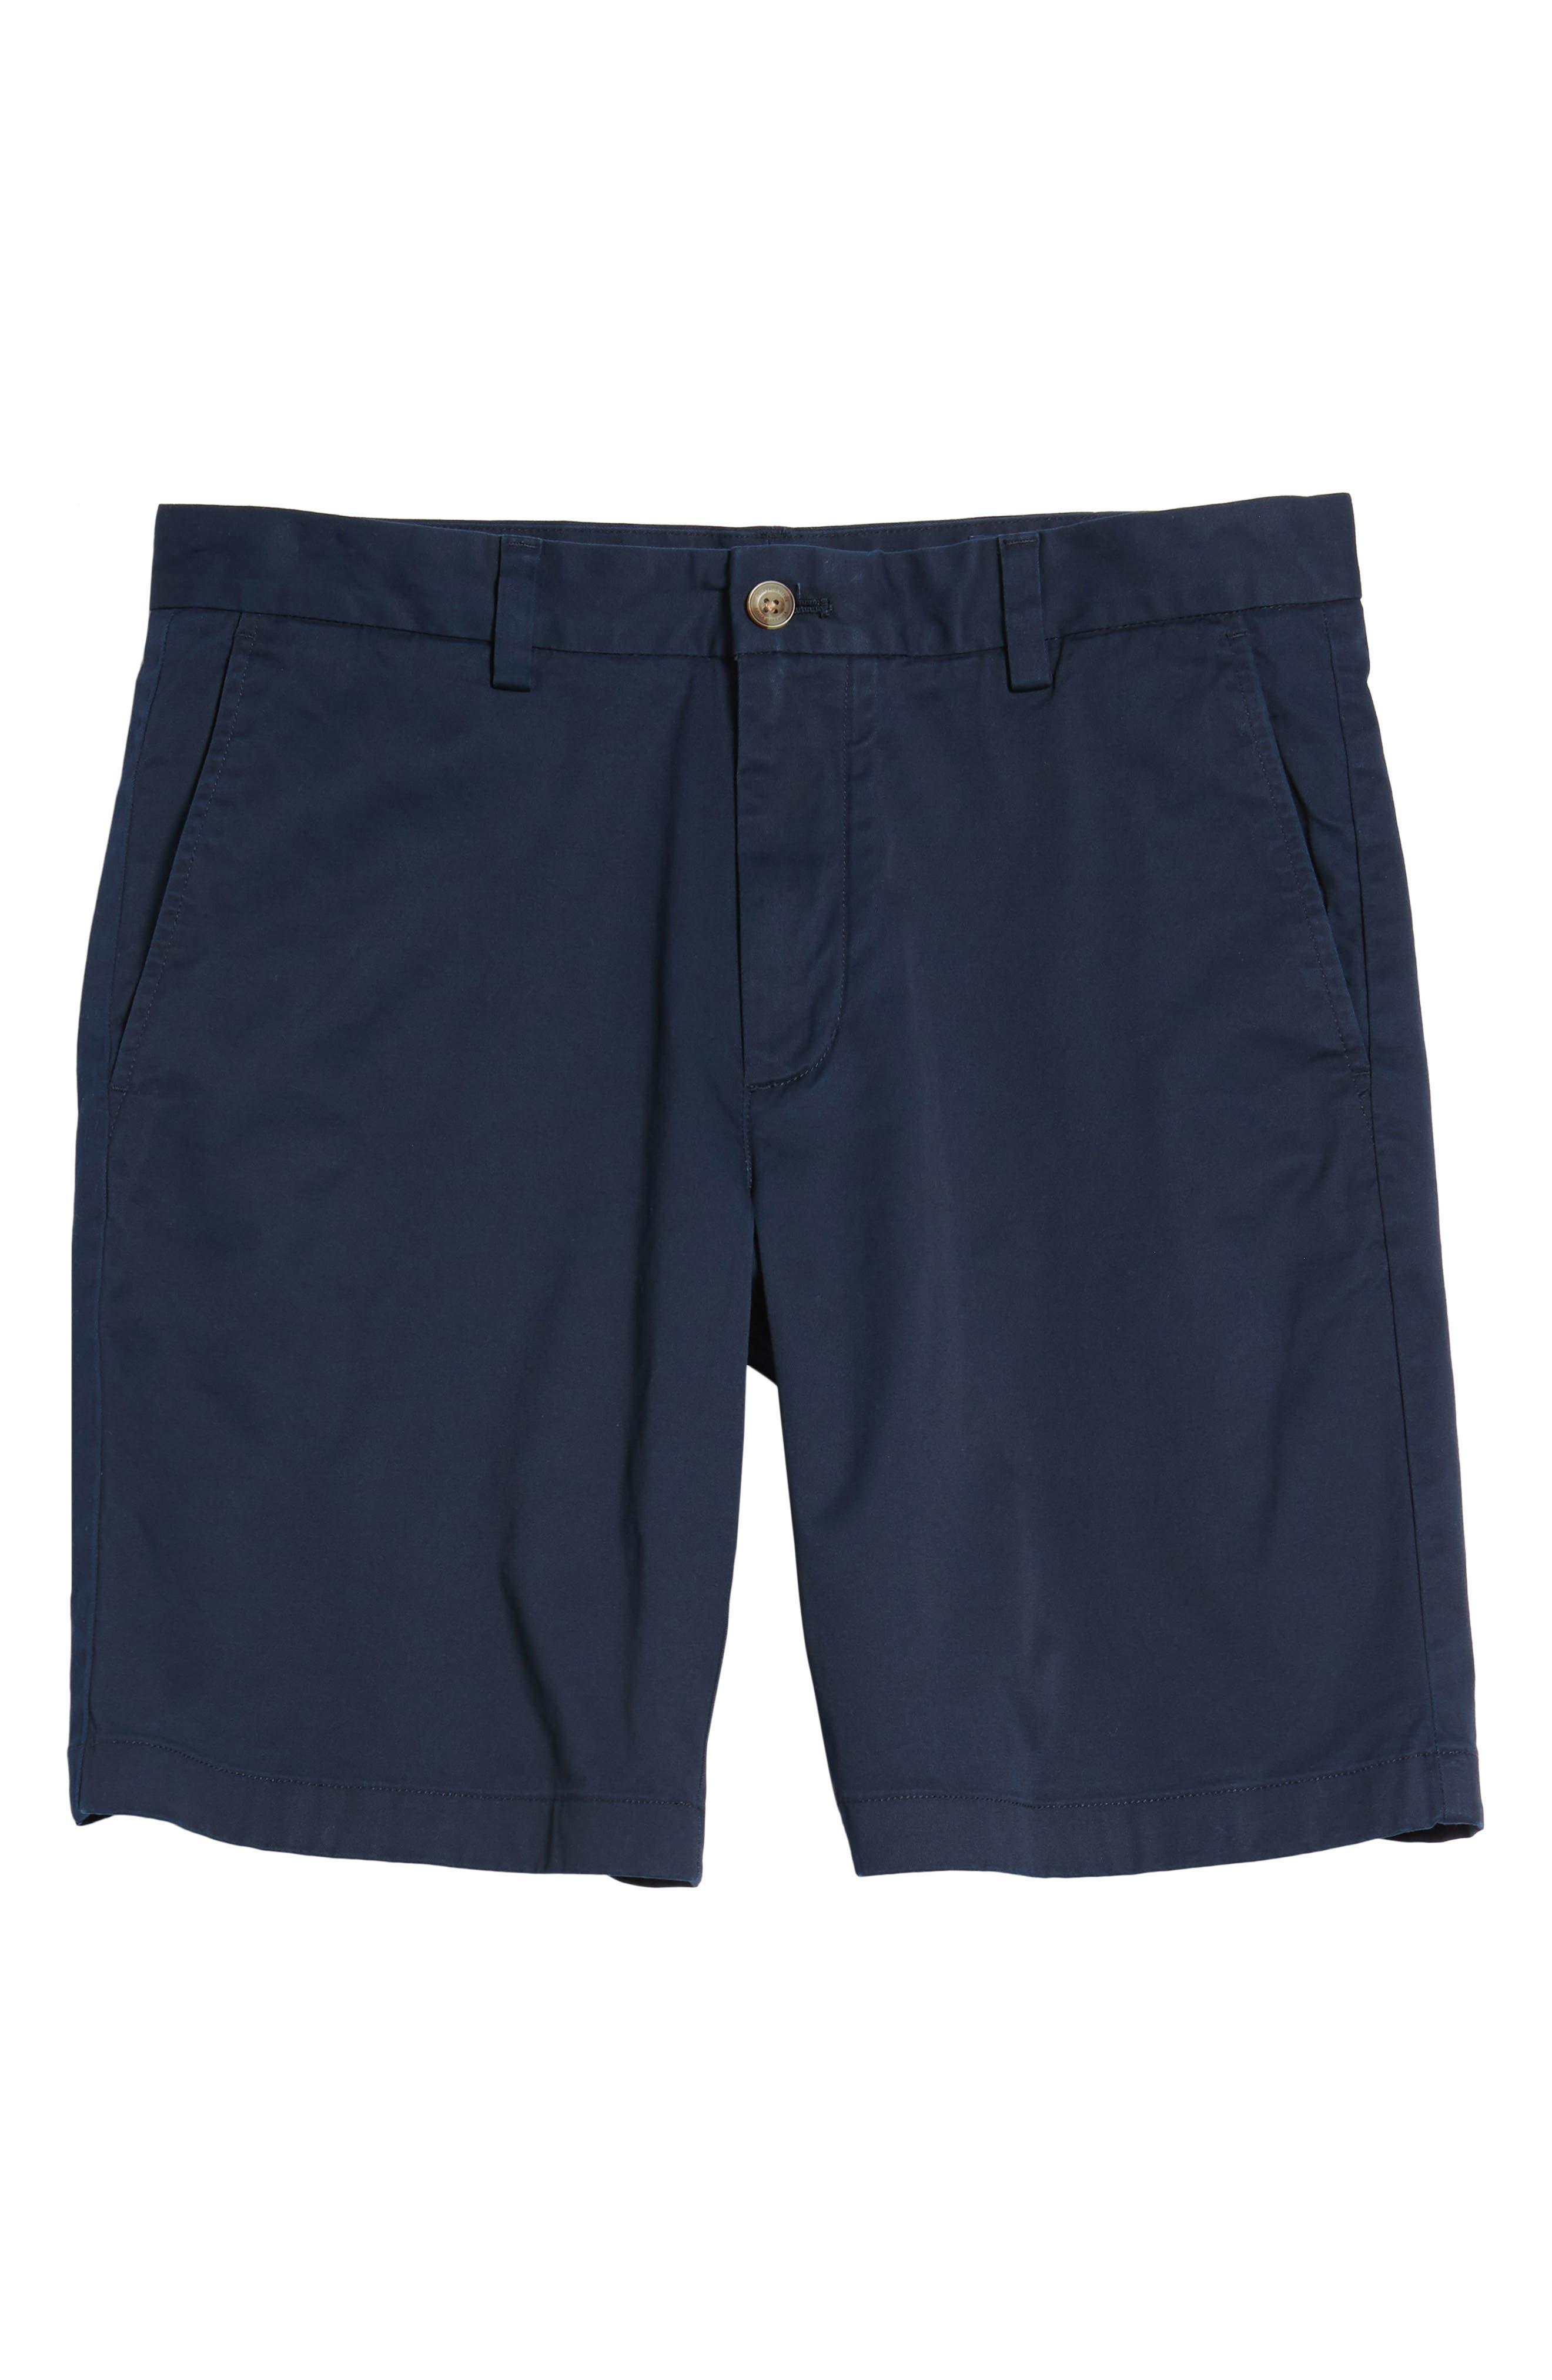 9 Inch Stretch Breaker Shorts,                             Alternate thumbnail 115, color,